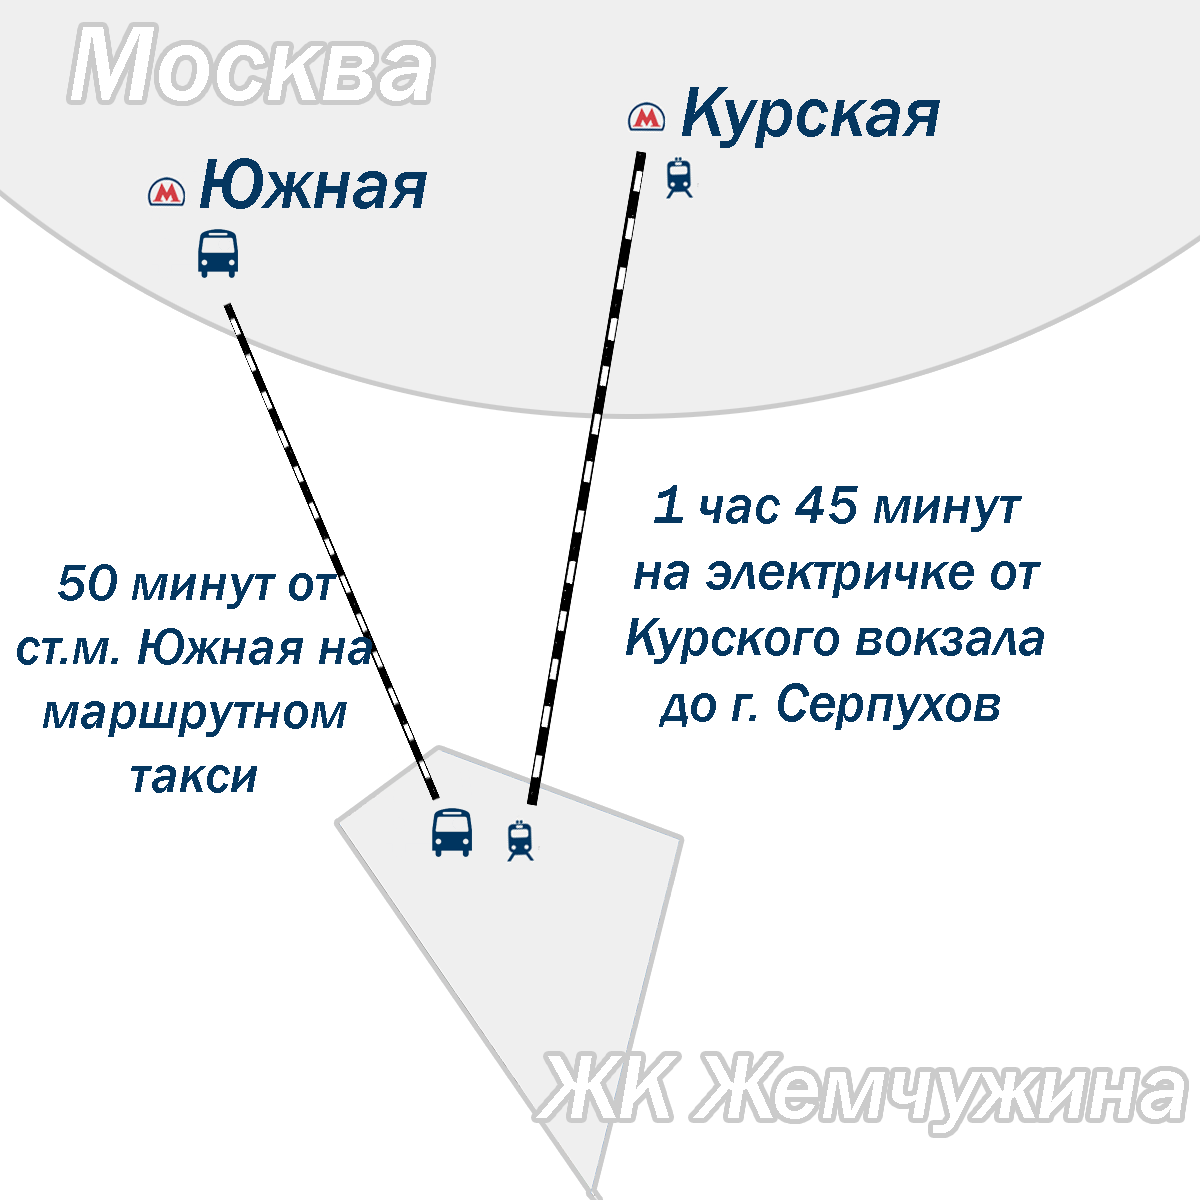 ЖК Жемчужина, Серпухов